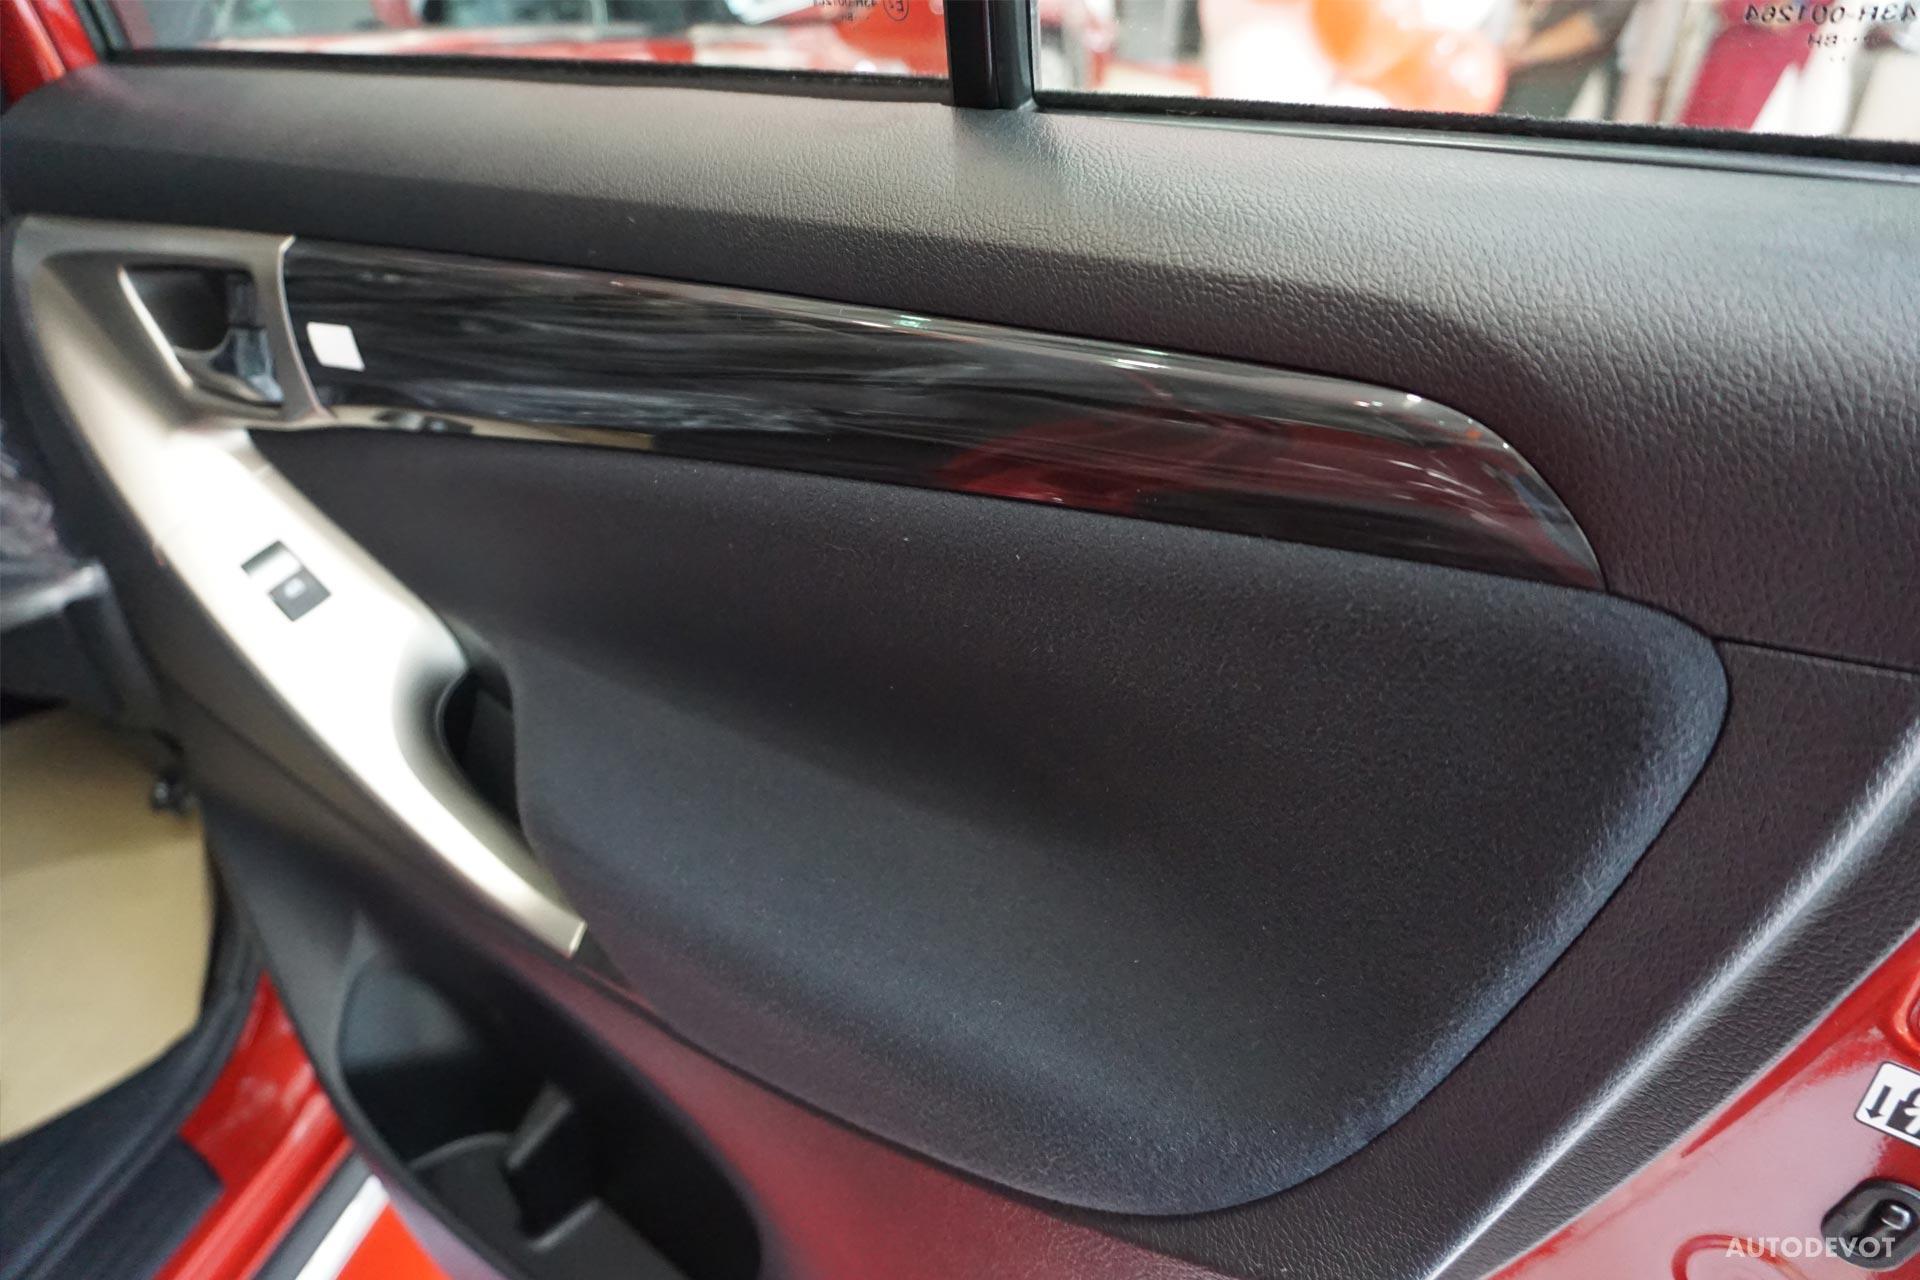 Toyota-Innova-Touring-Sport-interior-3